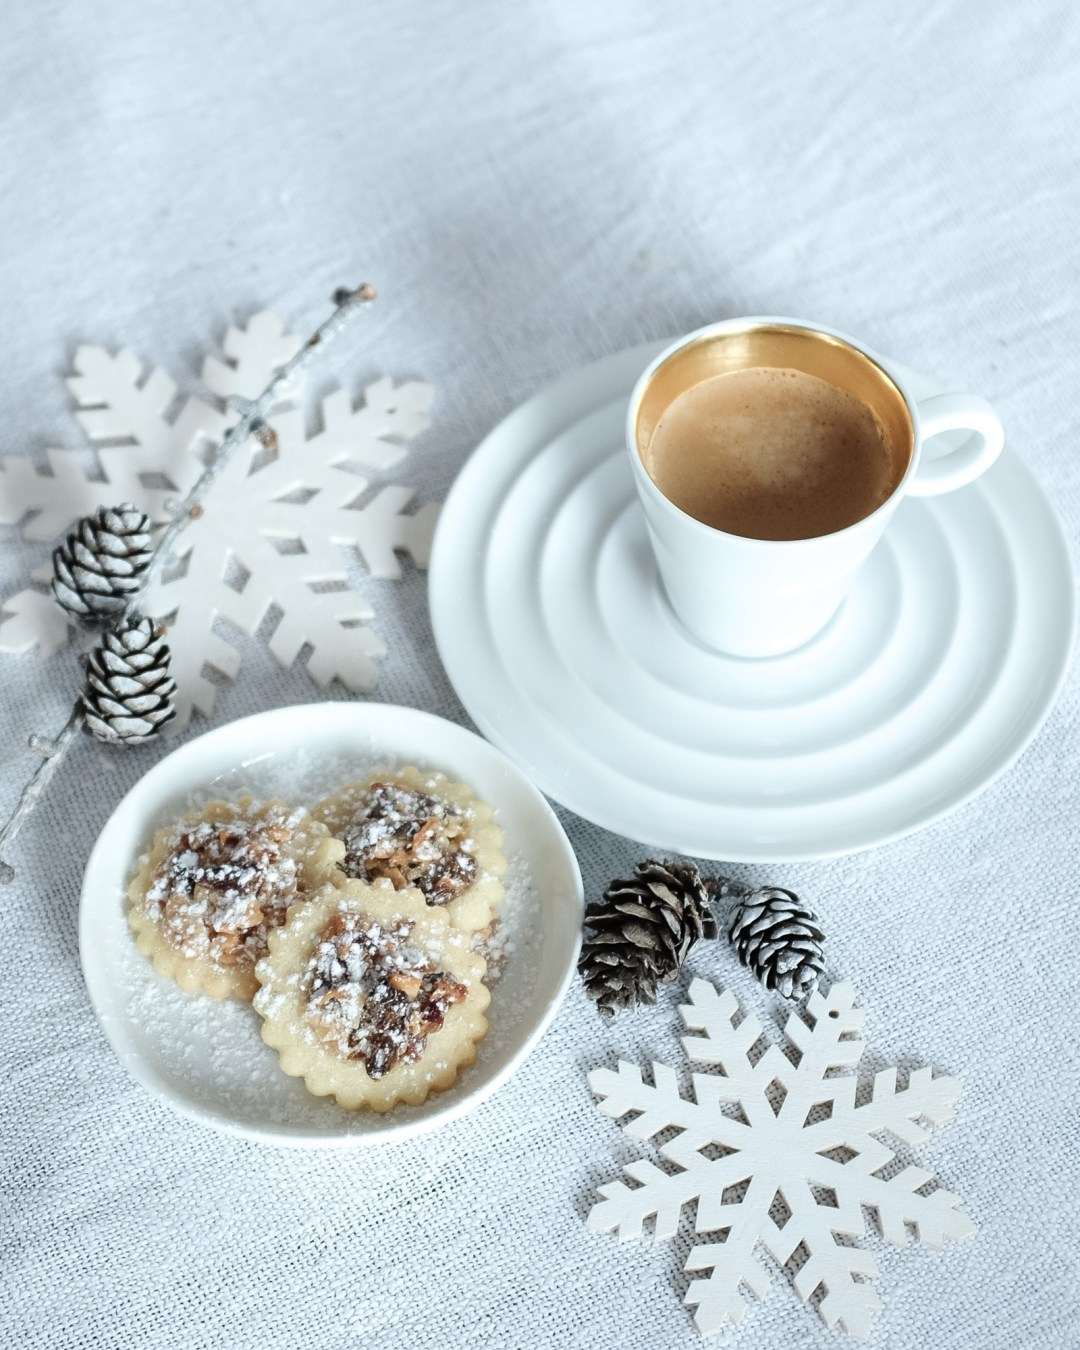 ina stil inastil advent keksebacken backen weihnachtskekse cookies christmas advent backen baking decoration christmastime weihnachtszeitDSCF0754